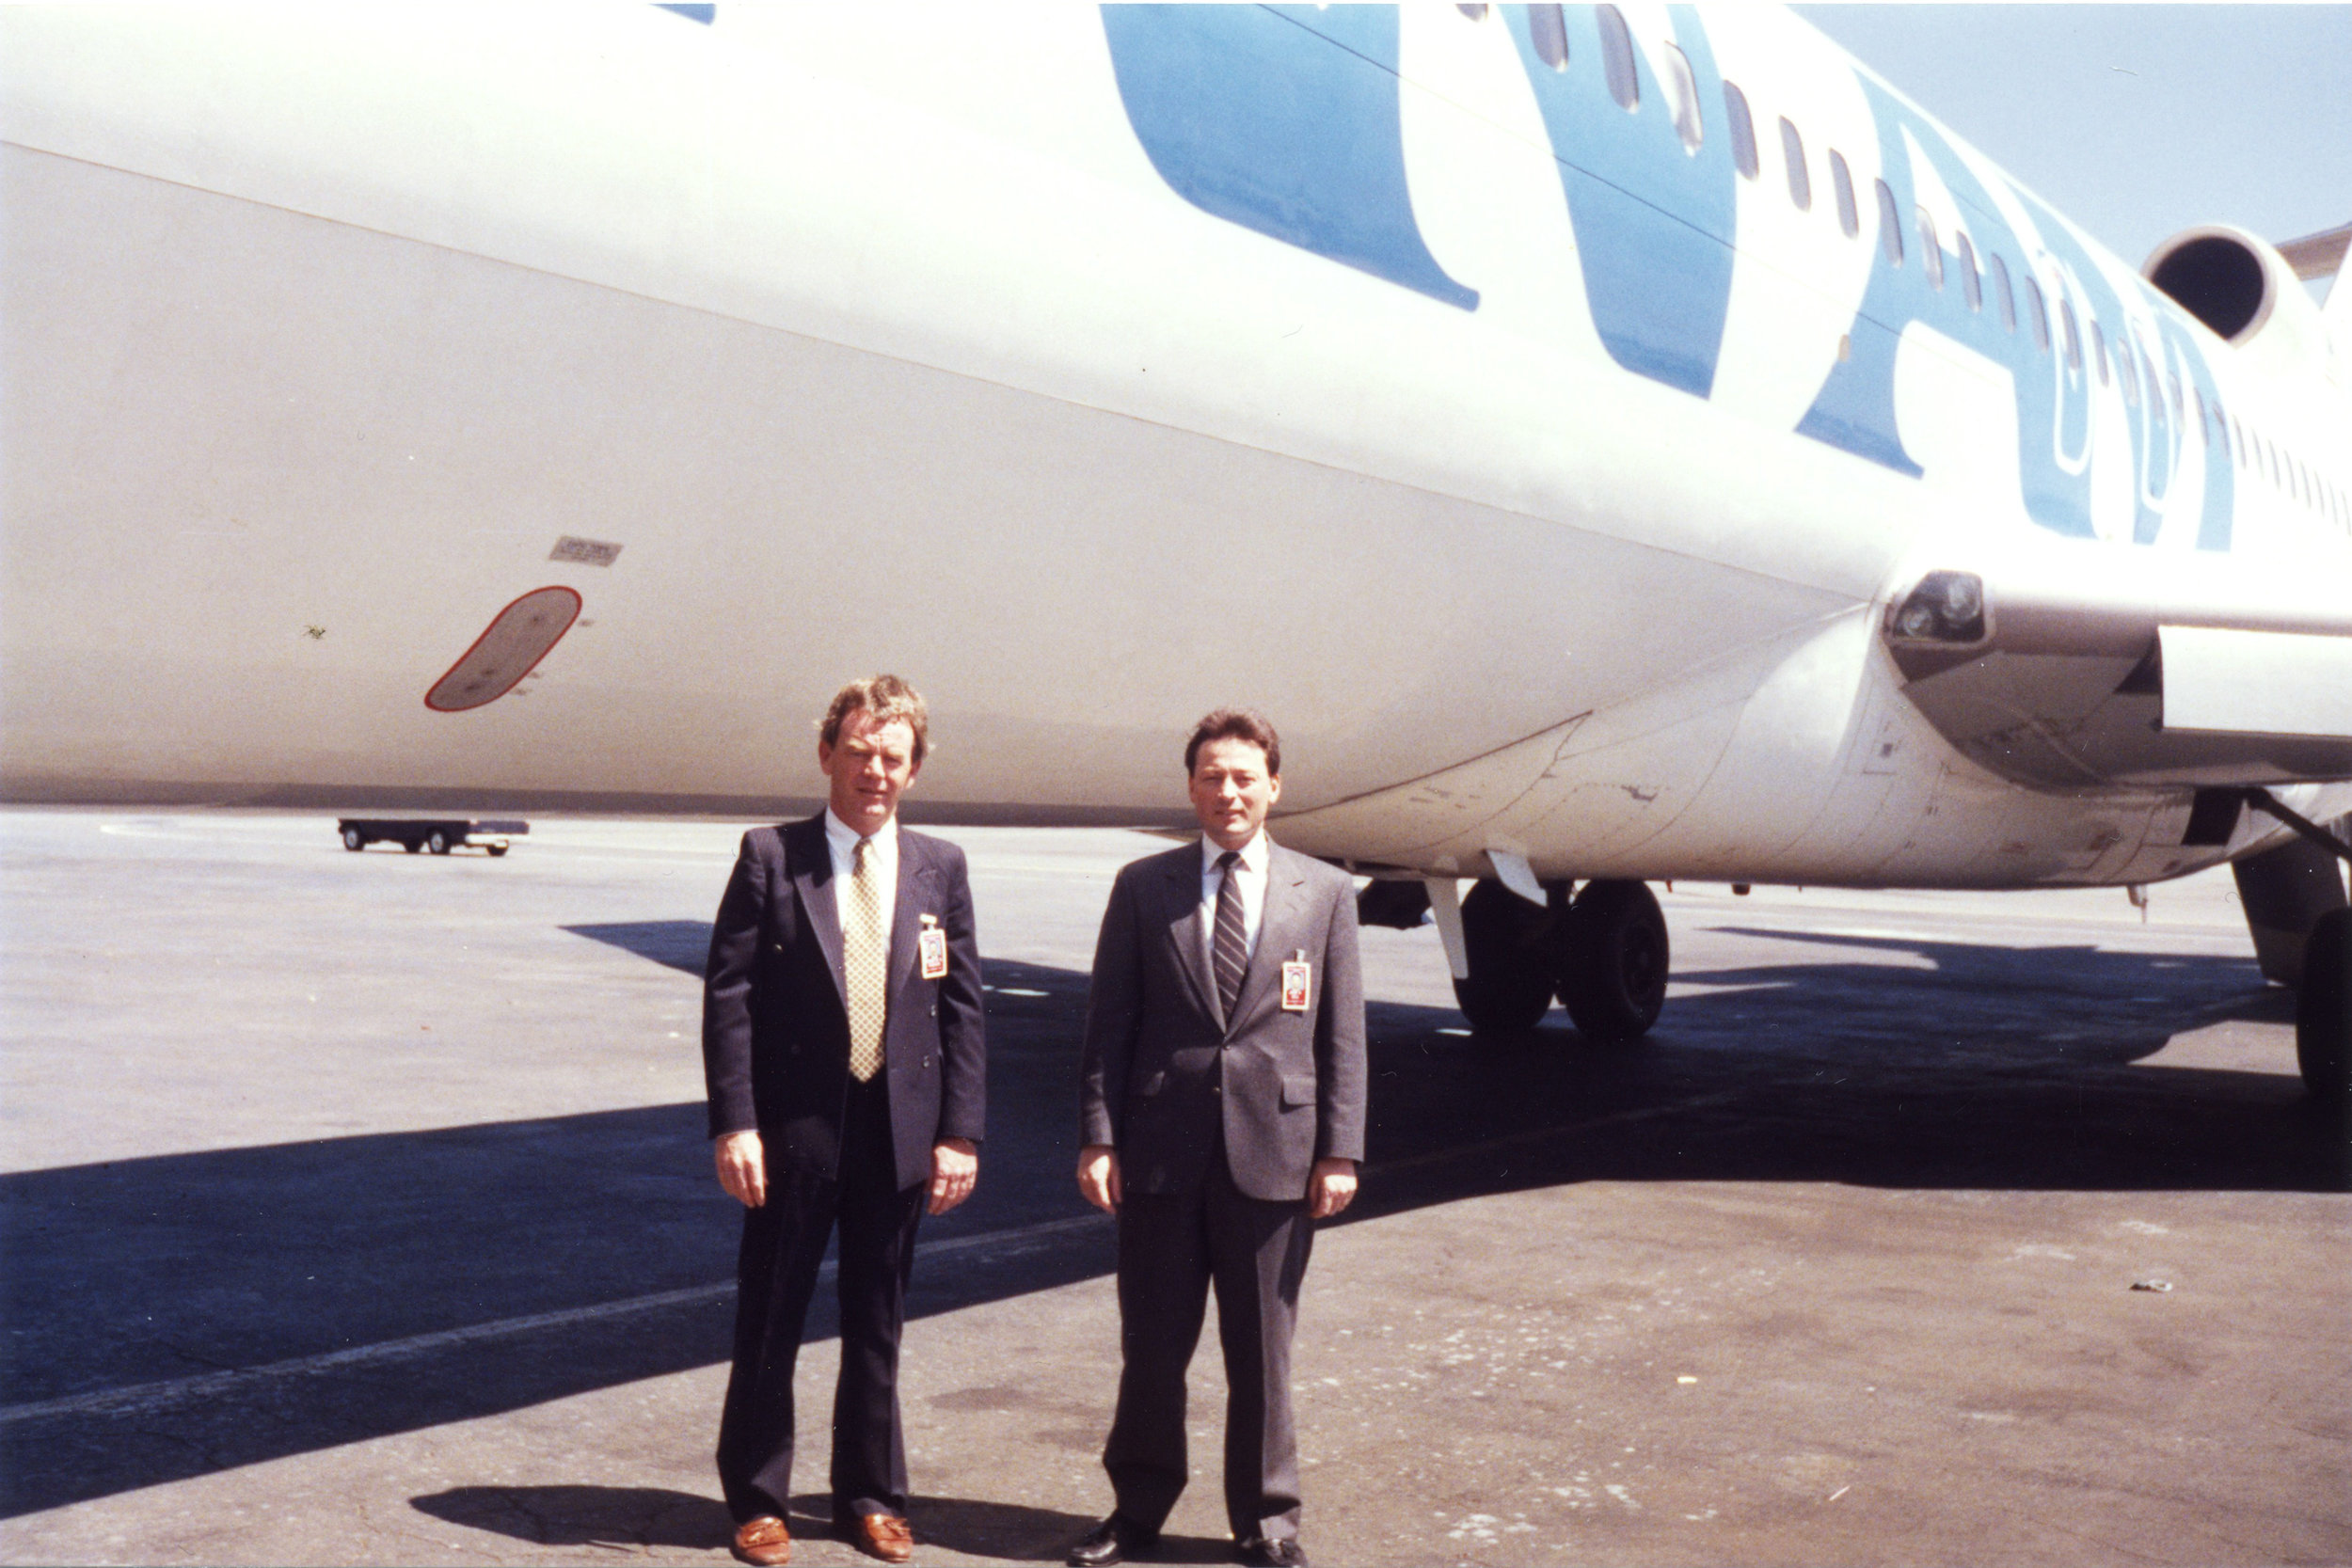 ken higgins and jay hill, 1989